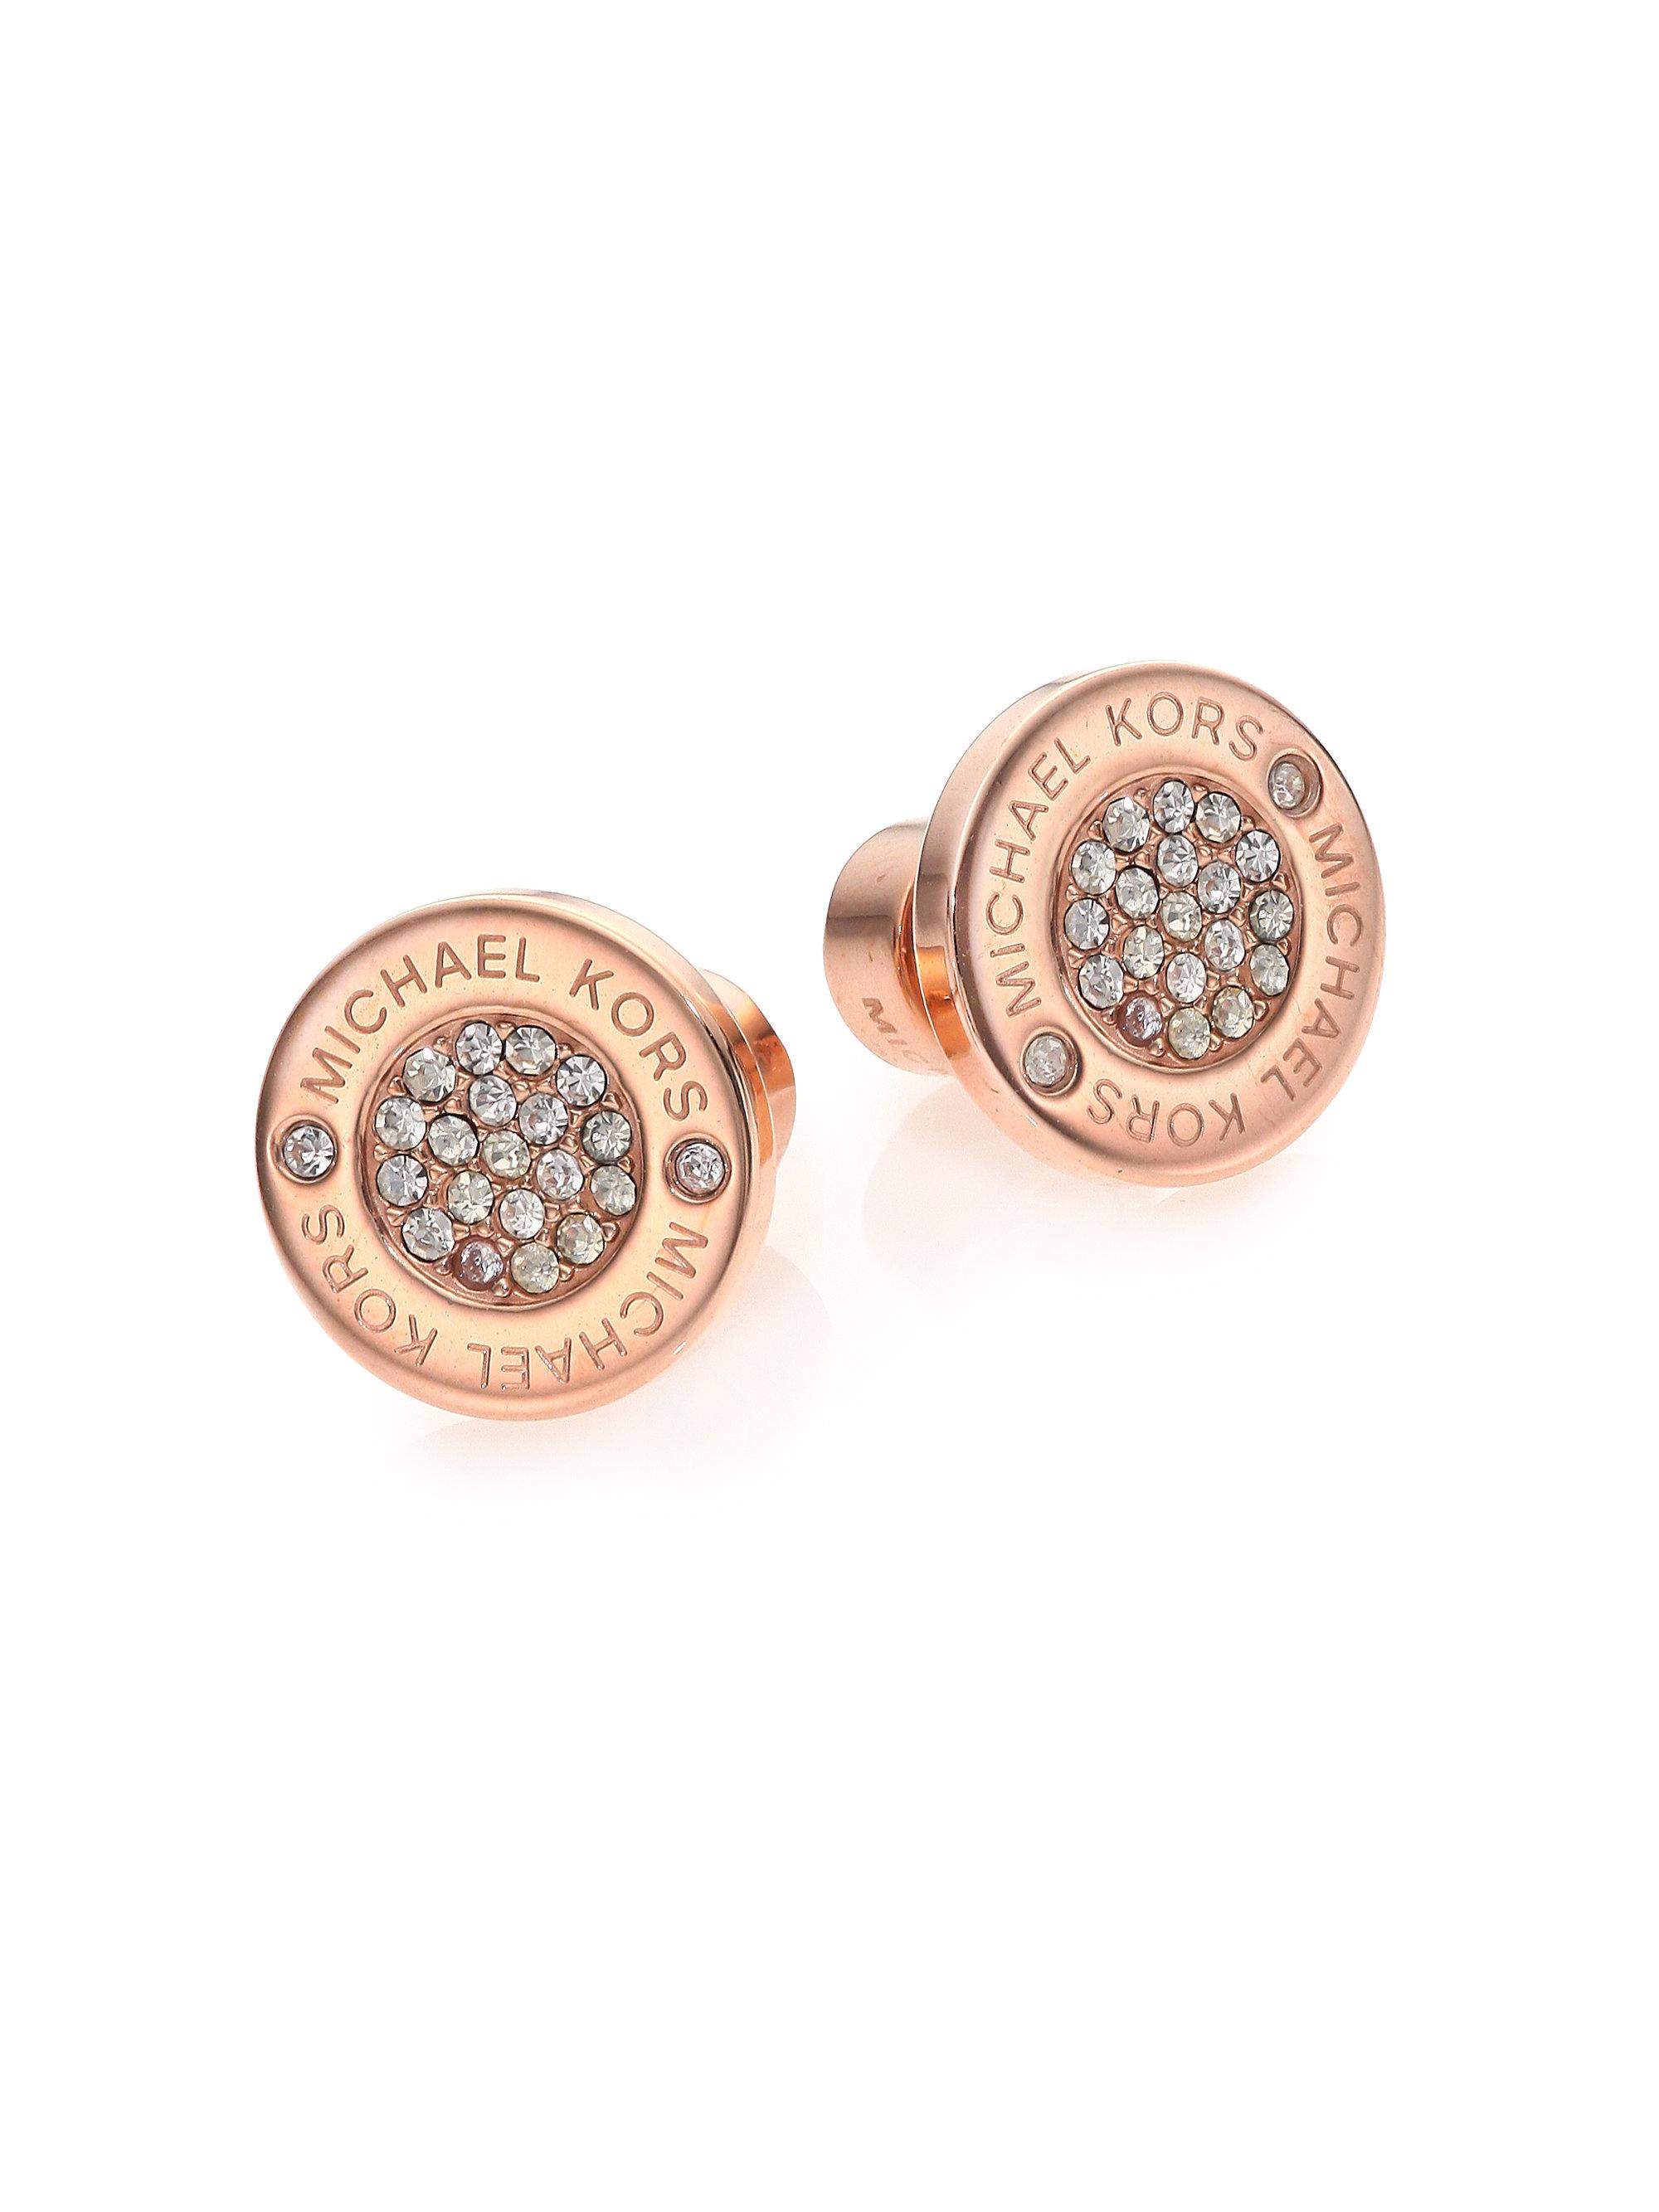 f4173e2a56d1ac michael kors rose gold pave hoop earrings jet set travel logo continental  wallet